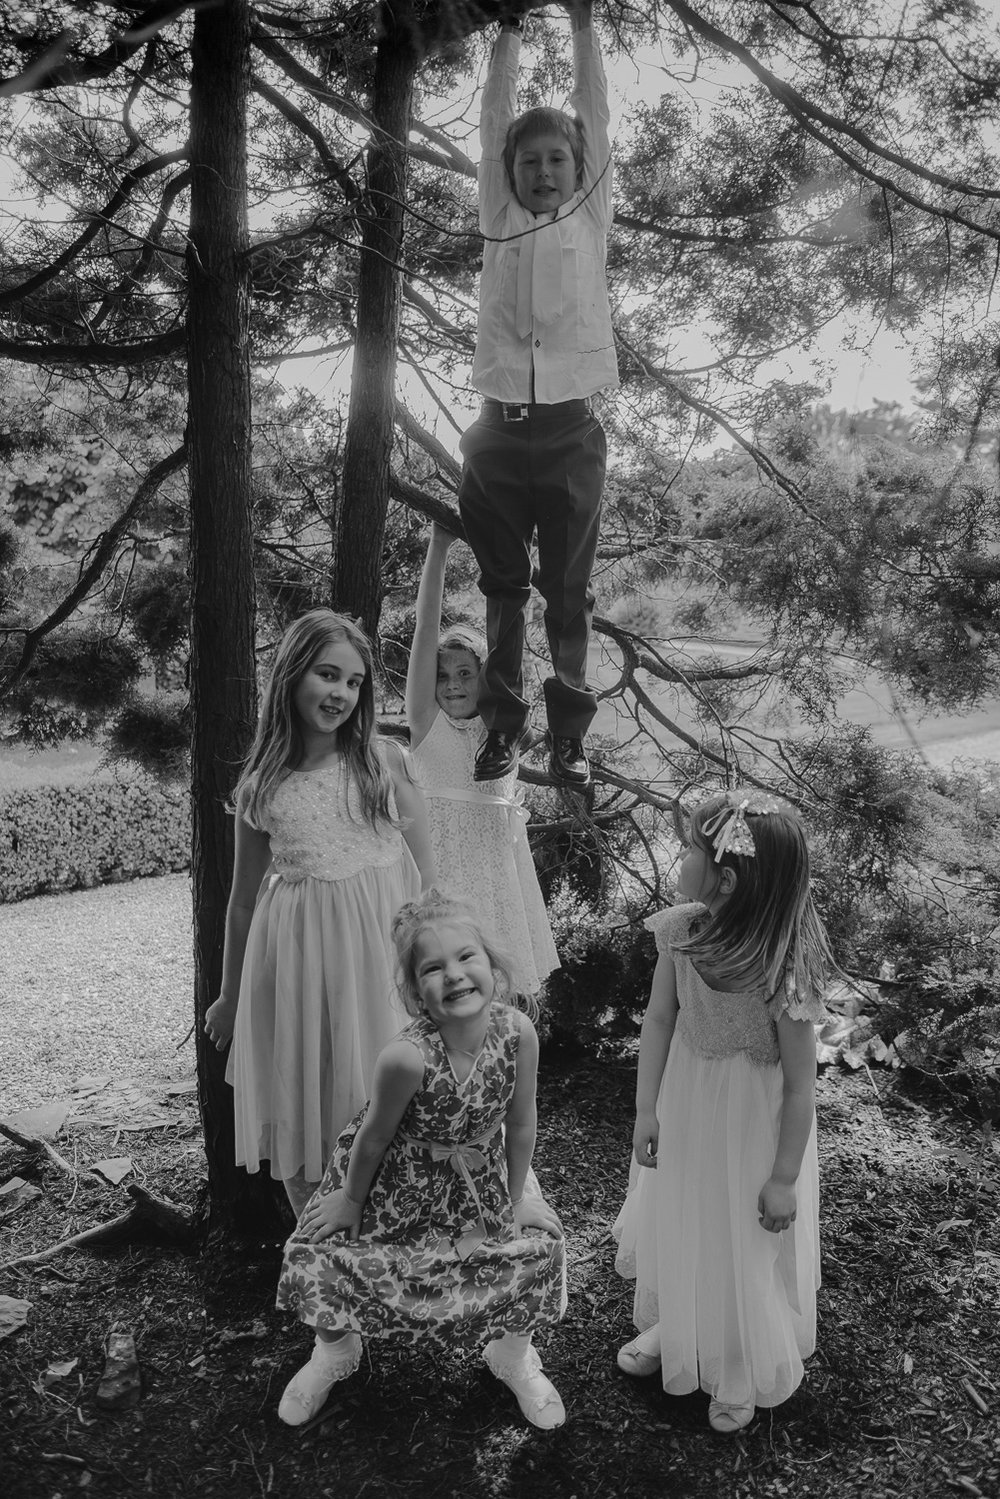 northern-ireland-wedding-photographer-esther-irvine-128.jpg